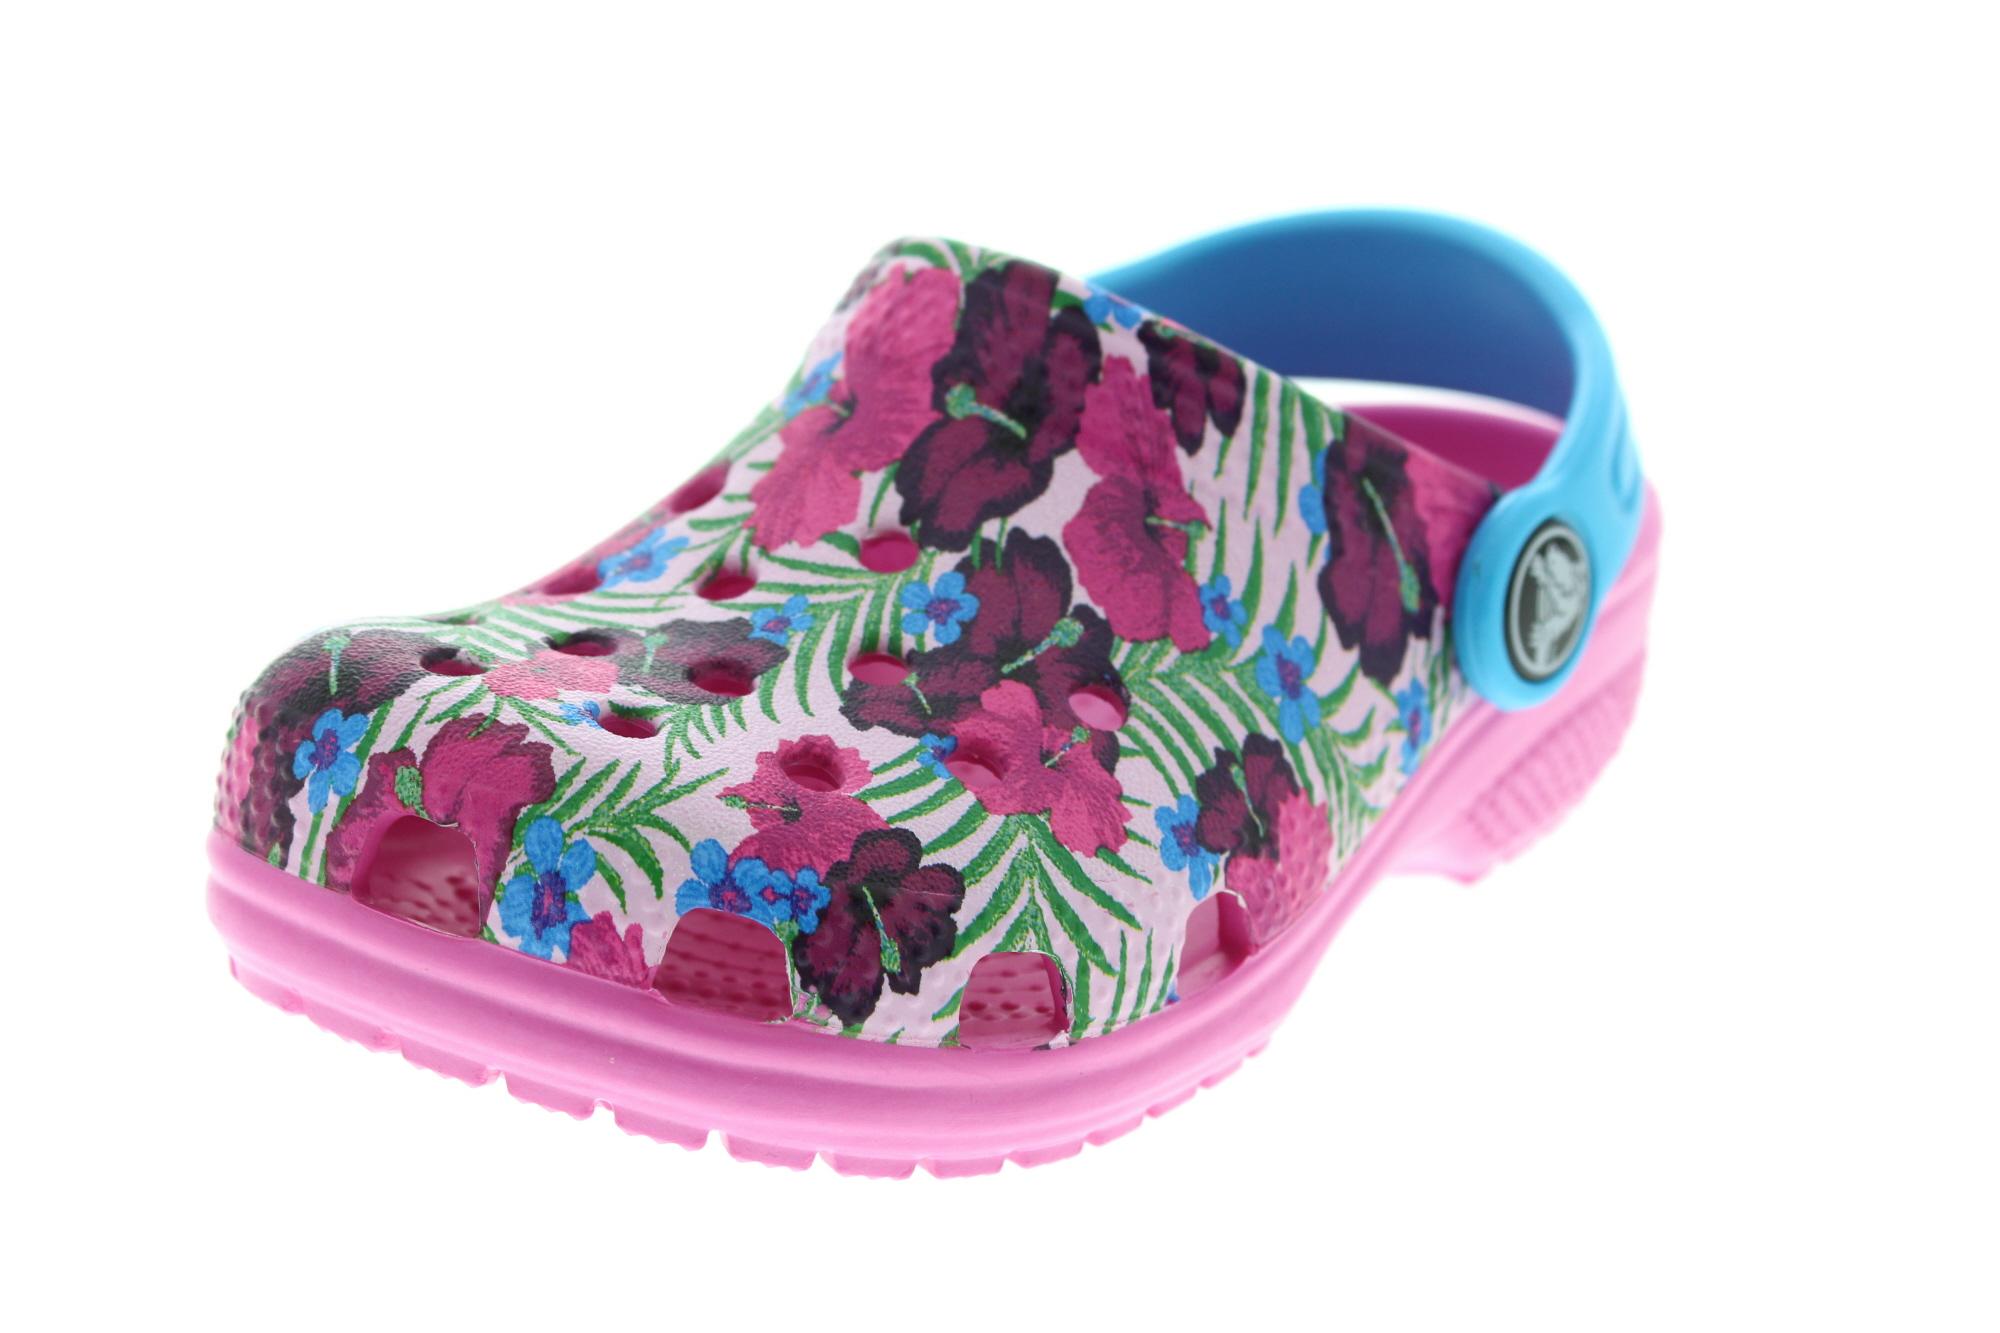 CROCS Kinderschuhe CLASSIC GRAPHIC CLOG multicolor pink0-6513